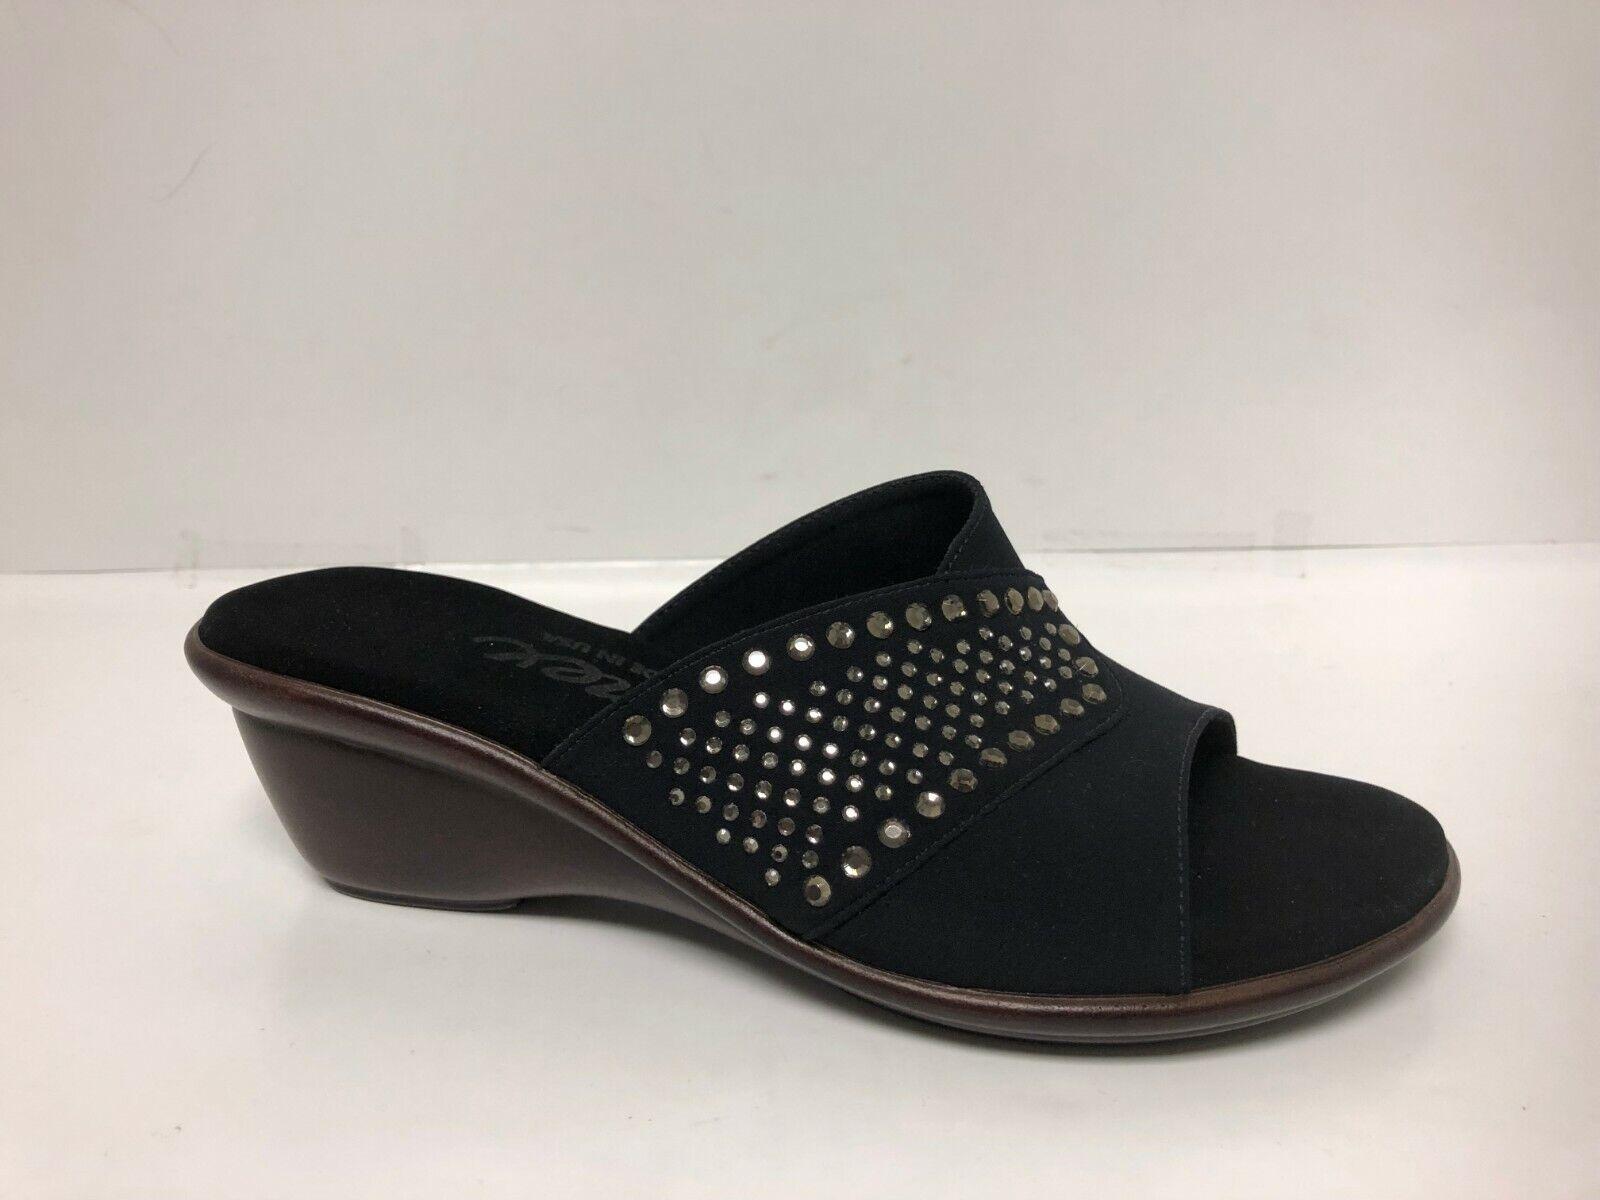 Onex Shine Mujer Cómodo Slip-On Cuña Sandalias Parte superior de tela negro